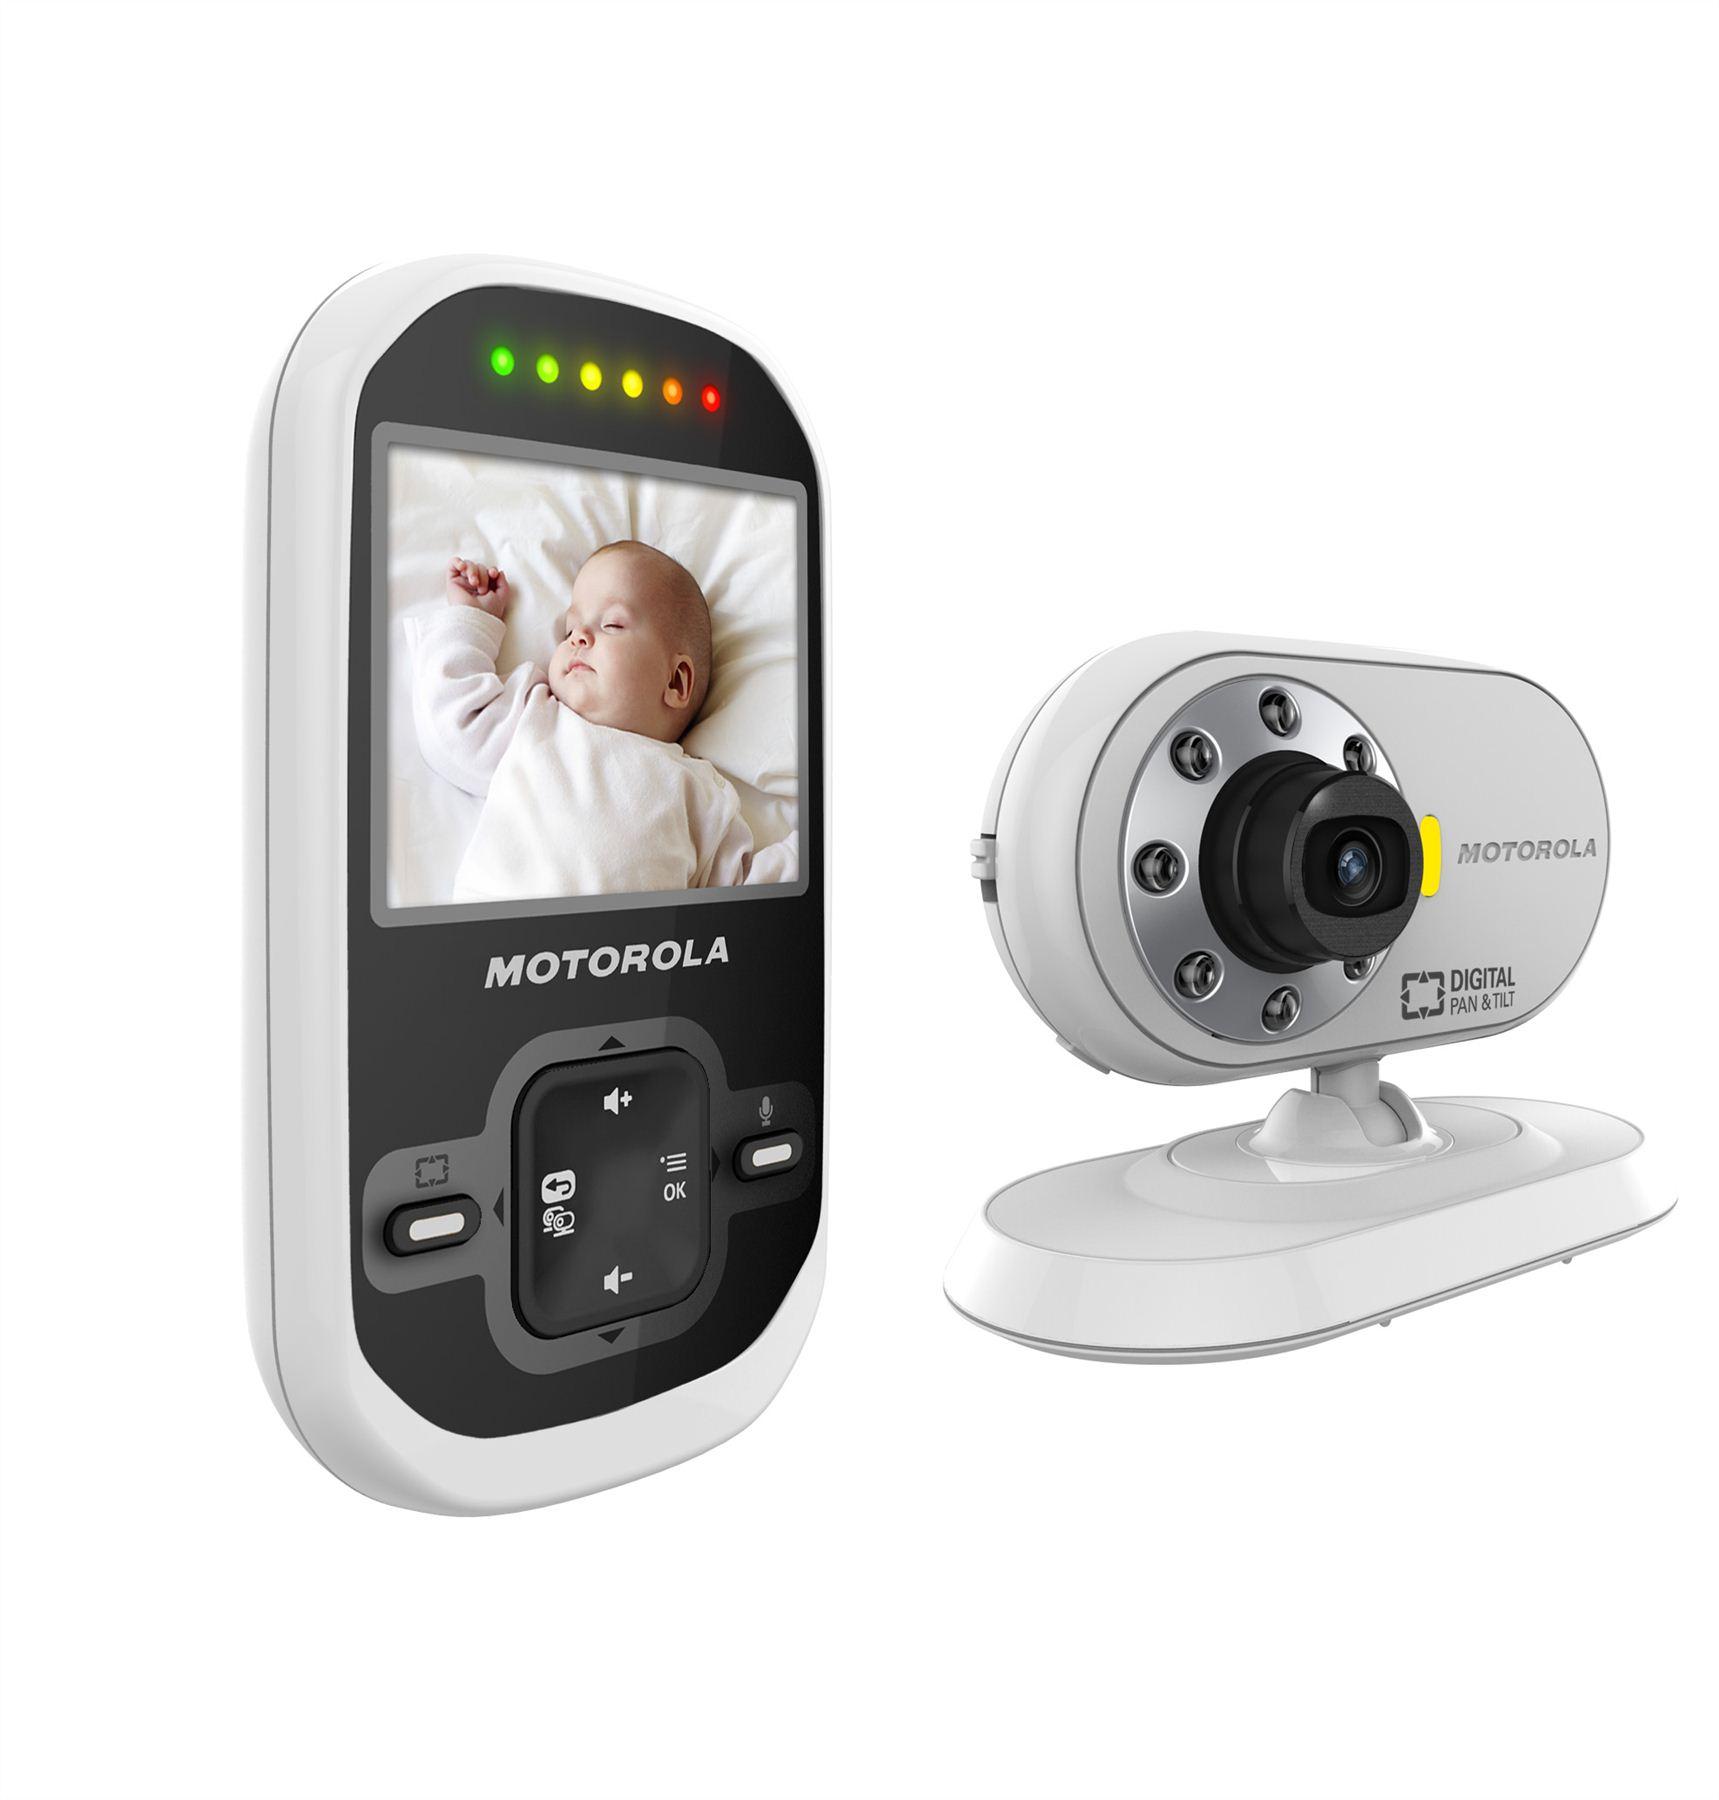 motorola mbp26 digital video camera baby monitor set with 2 4 colour lc. Black Bedroom Furniture Sets. Home Design Ideas